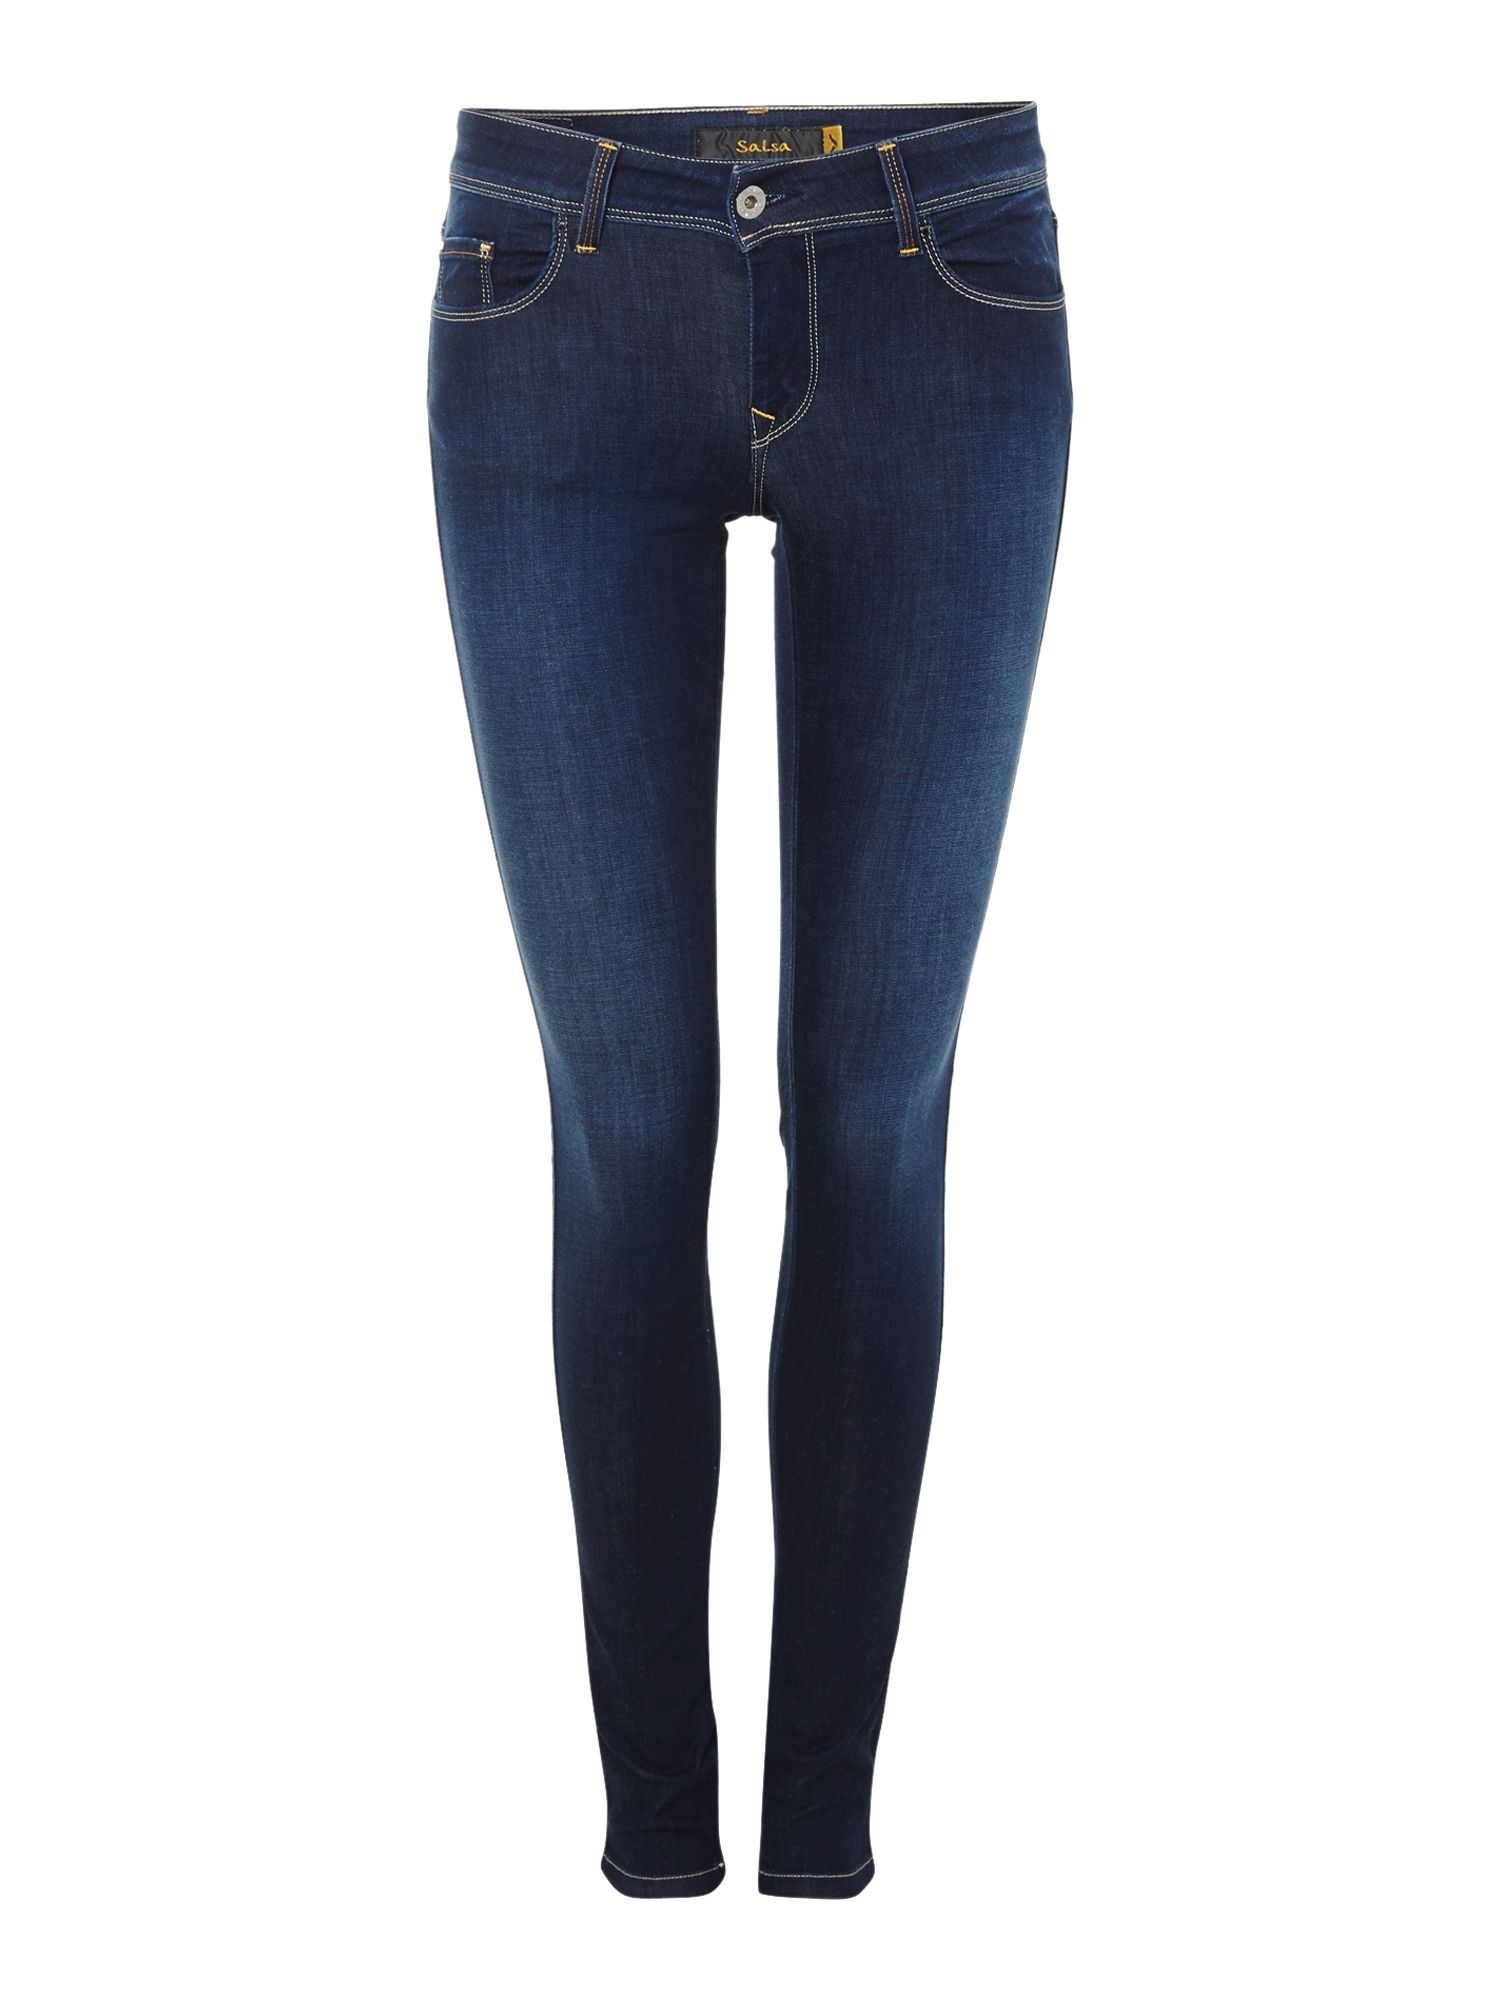 salsa colette skinny soft touch jeans in blue lyst. Black Bedroom Furniture Sets. Home Design Ideas